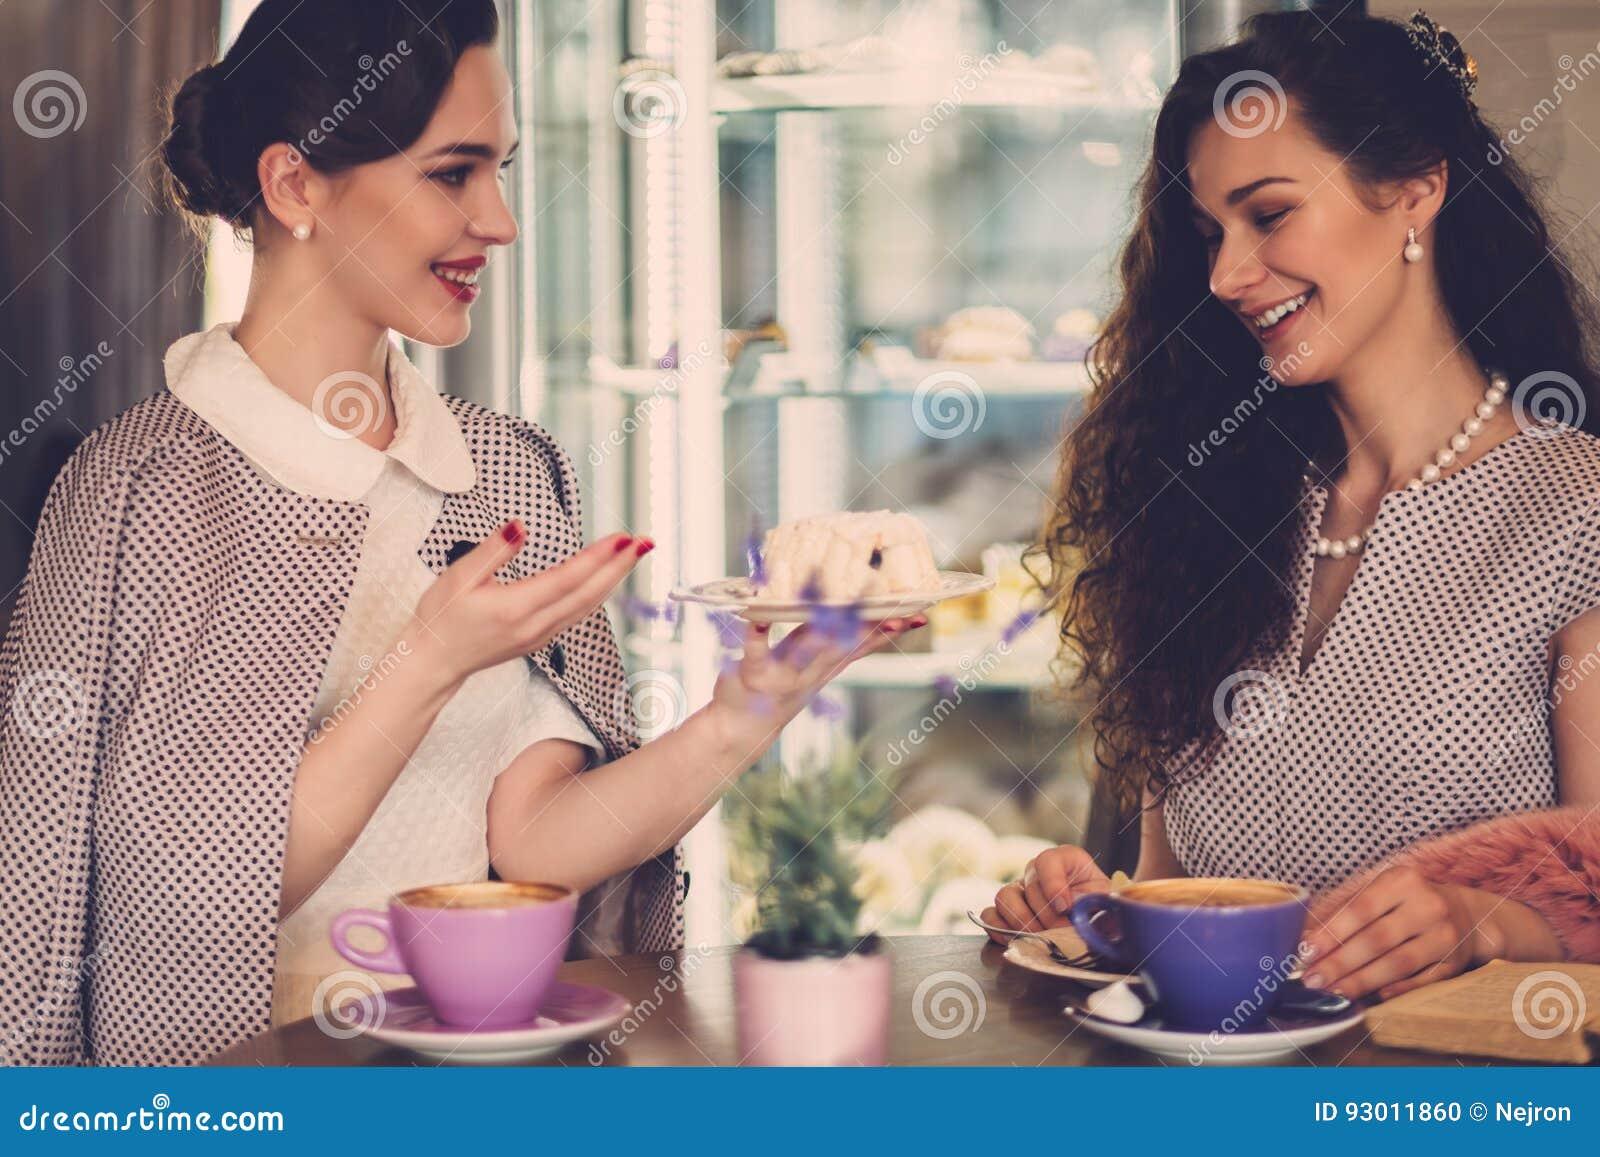 Dating για κυρίες στάδια της χρονολόγηση κάποιος